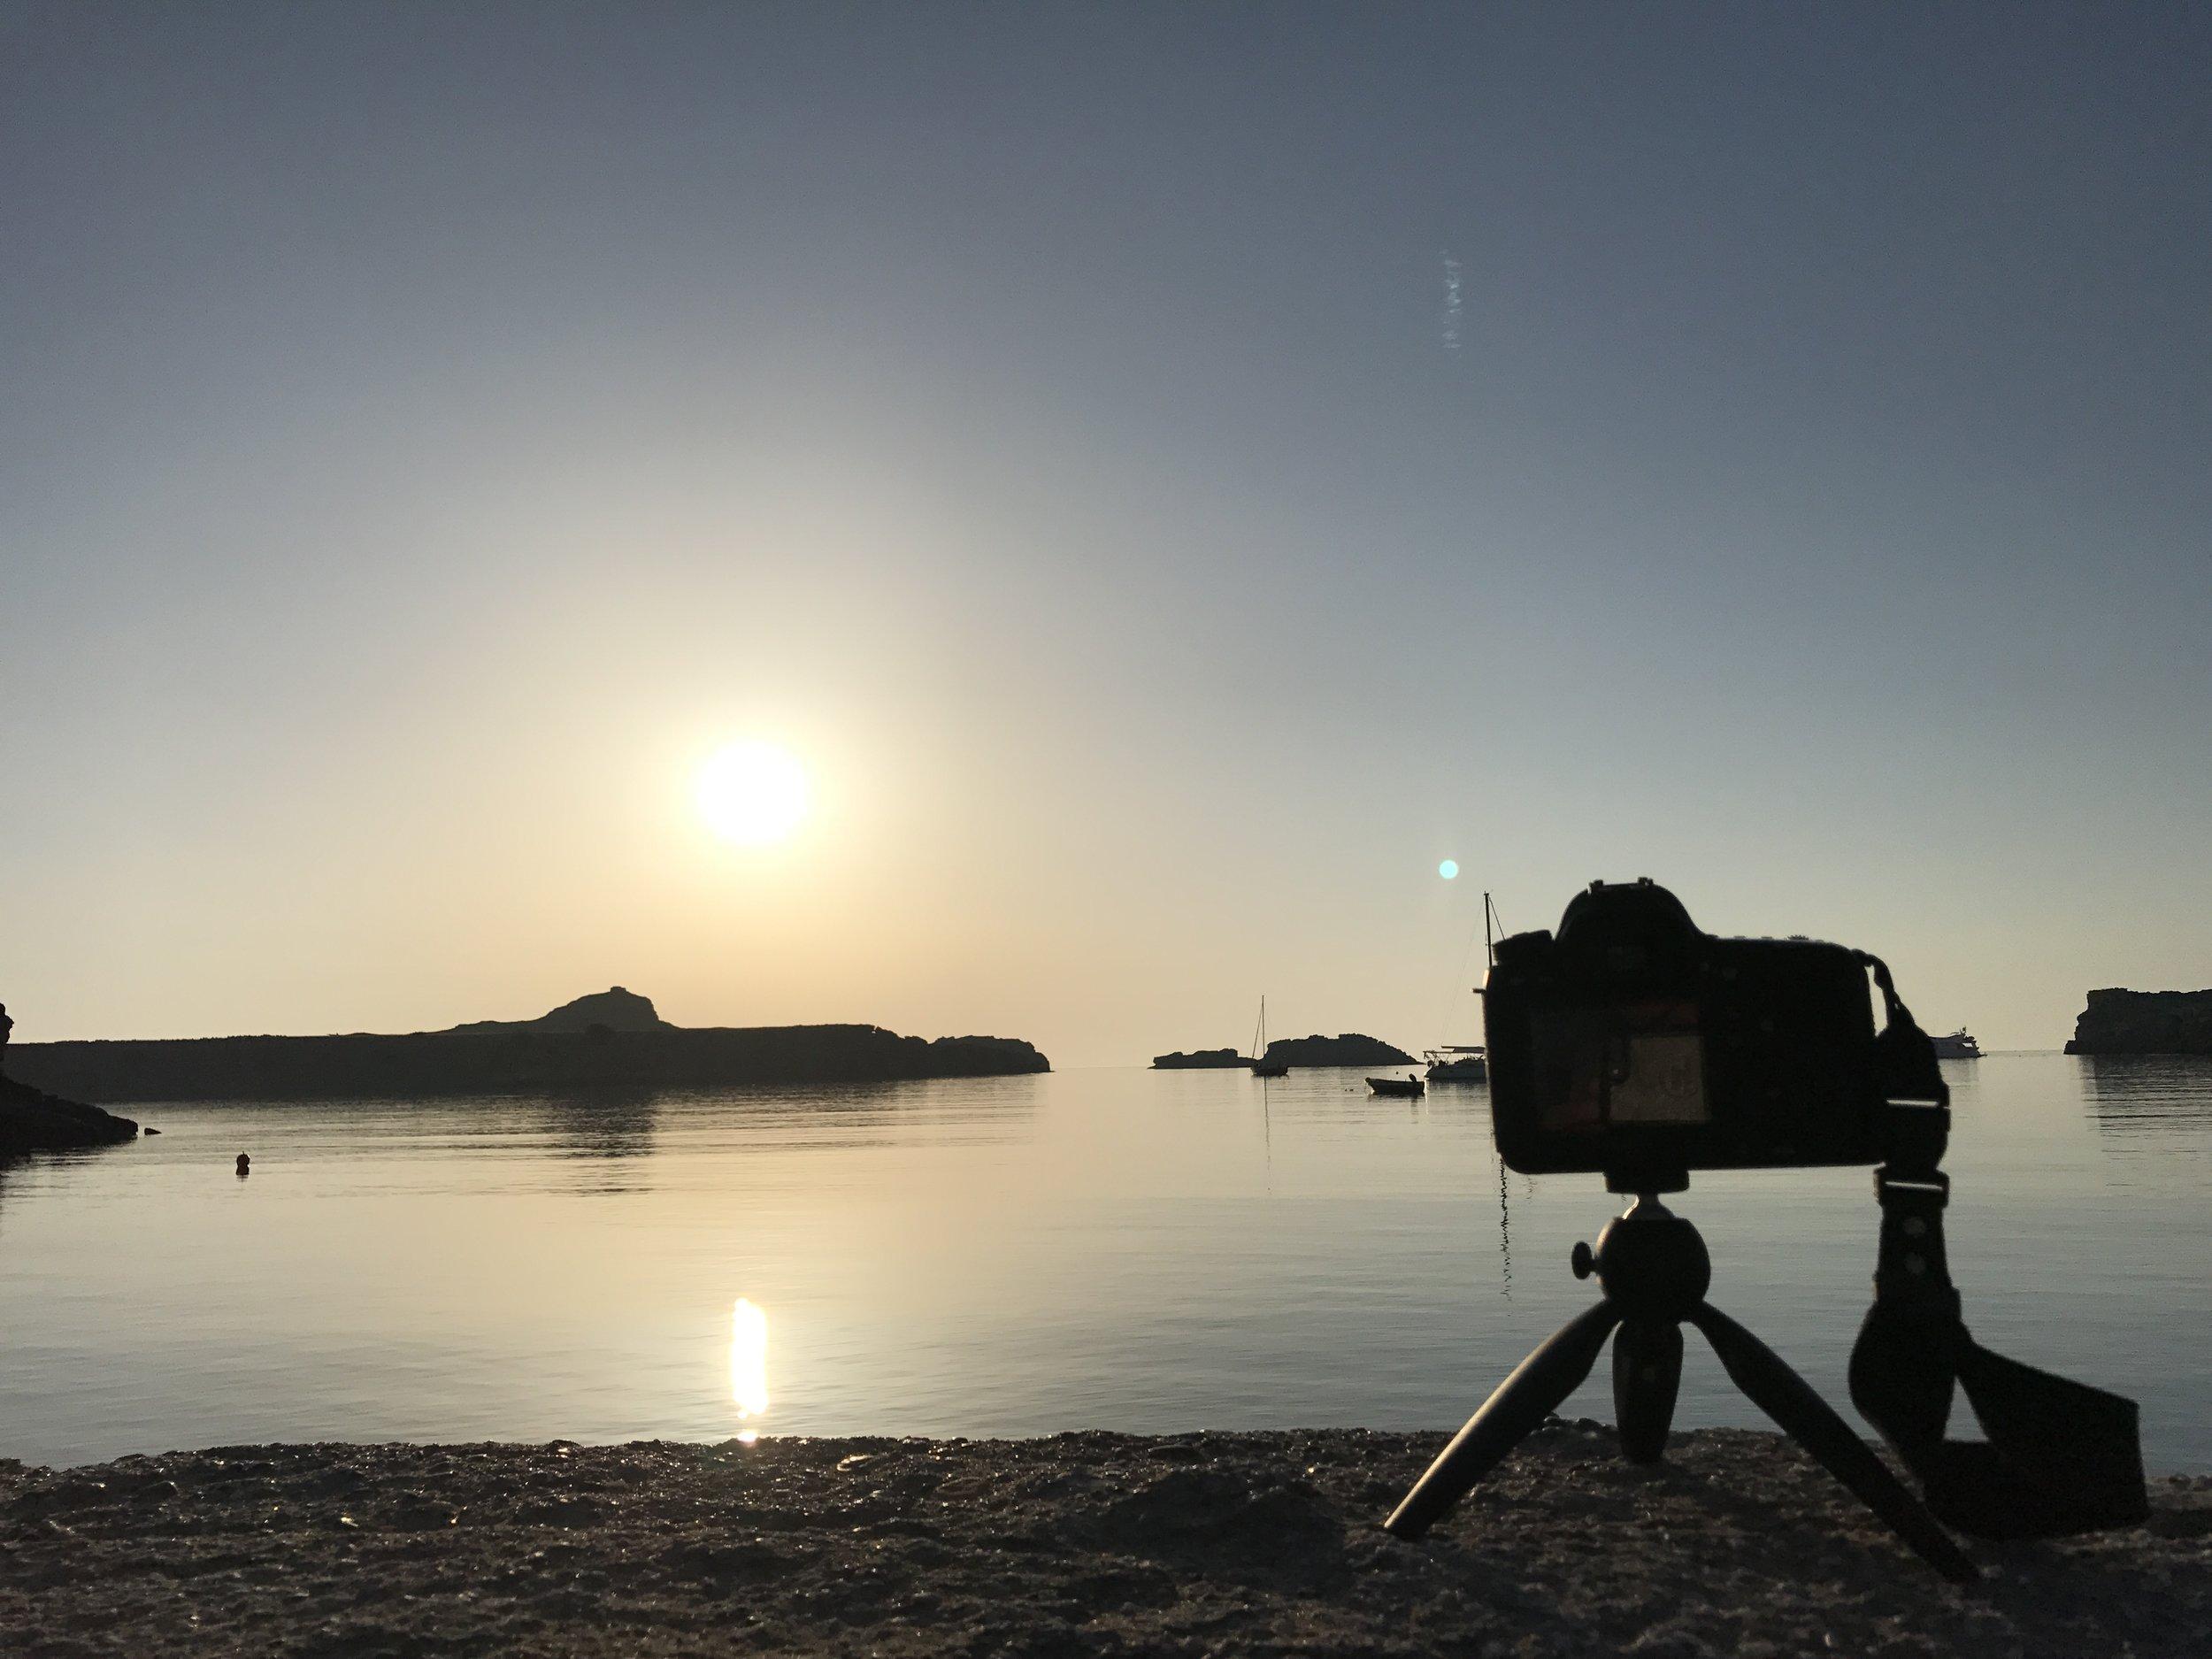 Sunrise at Lindos Beach by me, travel photographer Rick McEvoy